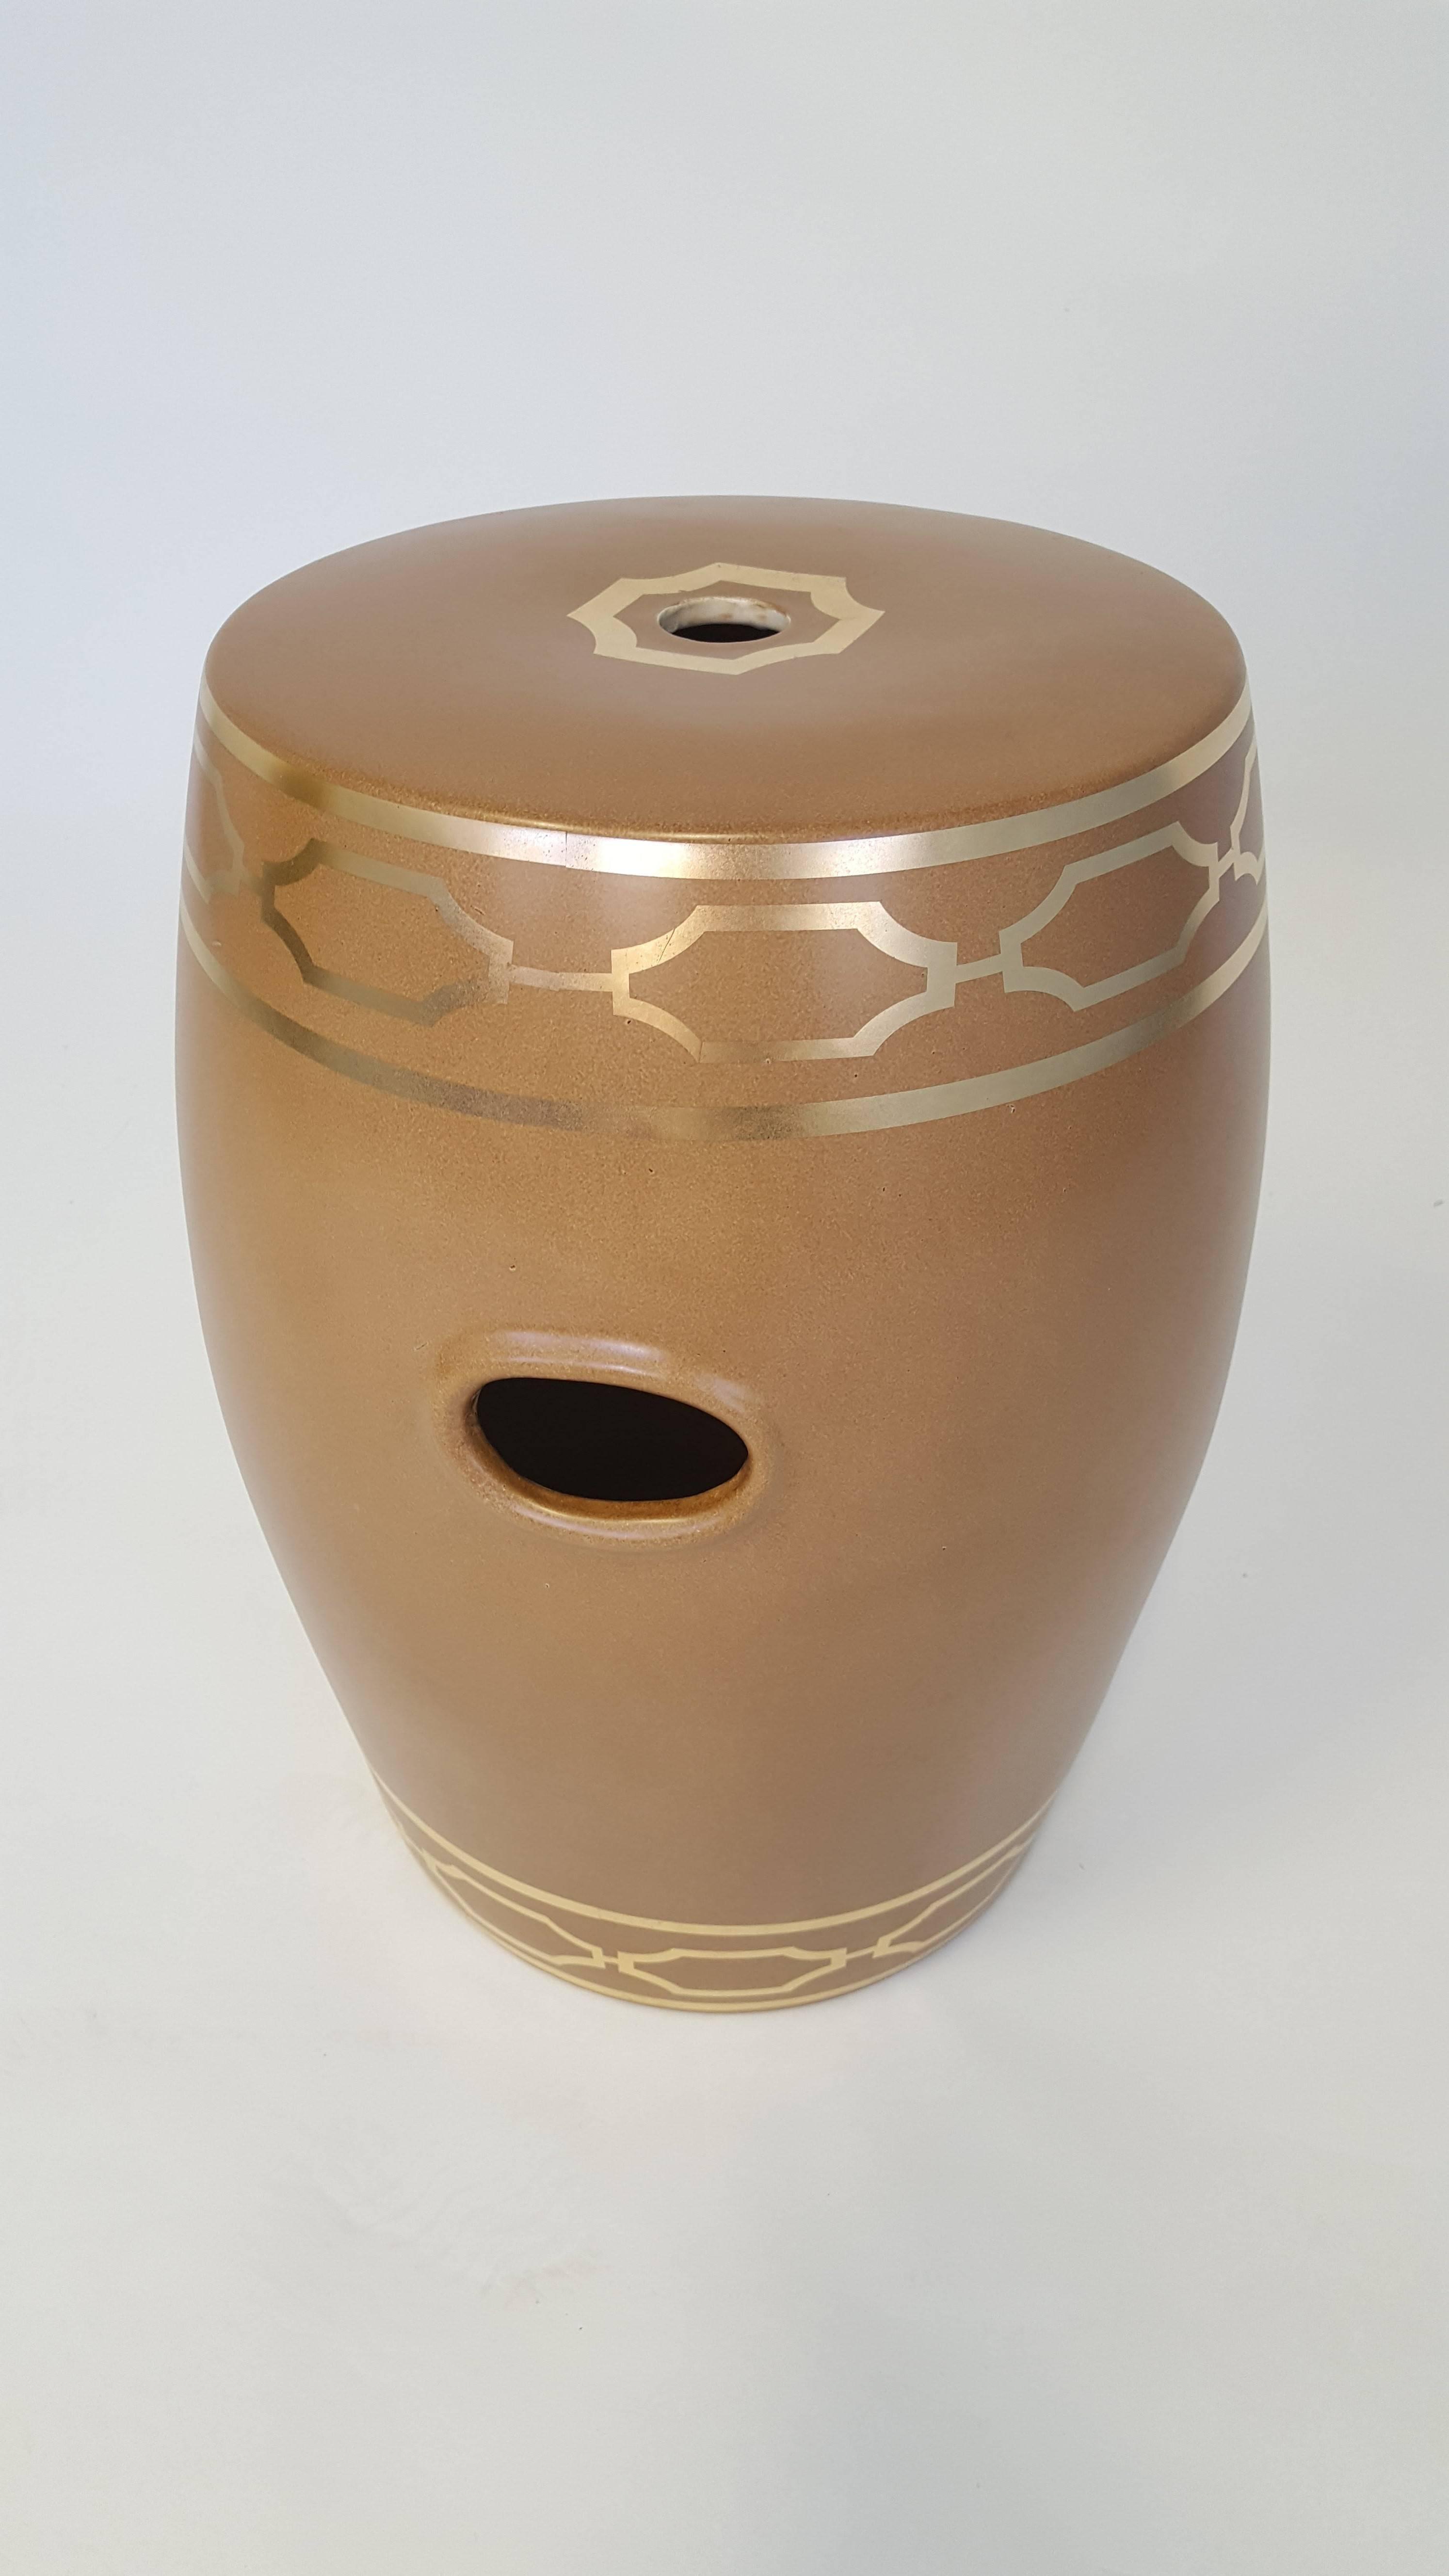 Scalamandre Porcelain Garden Stool For Sale at 1stdibs